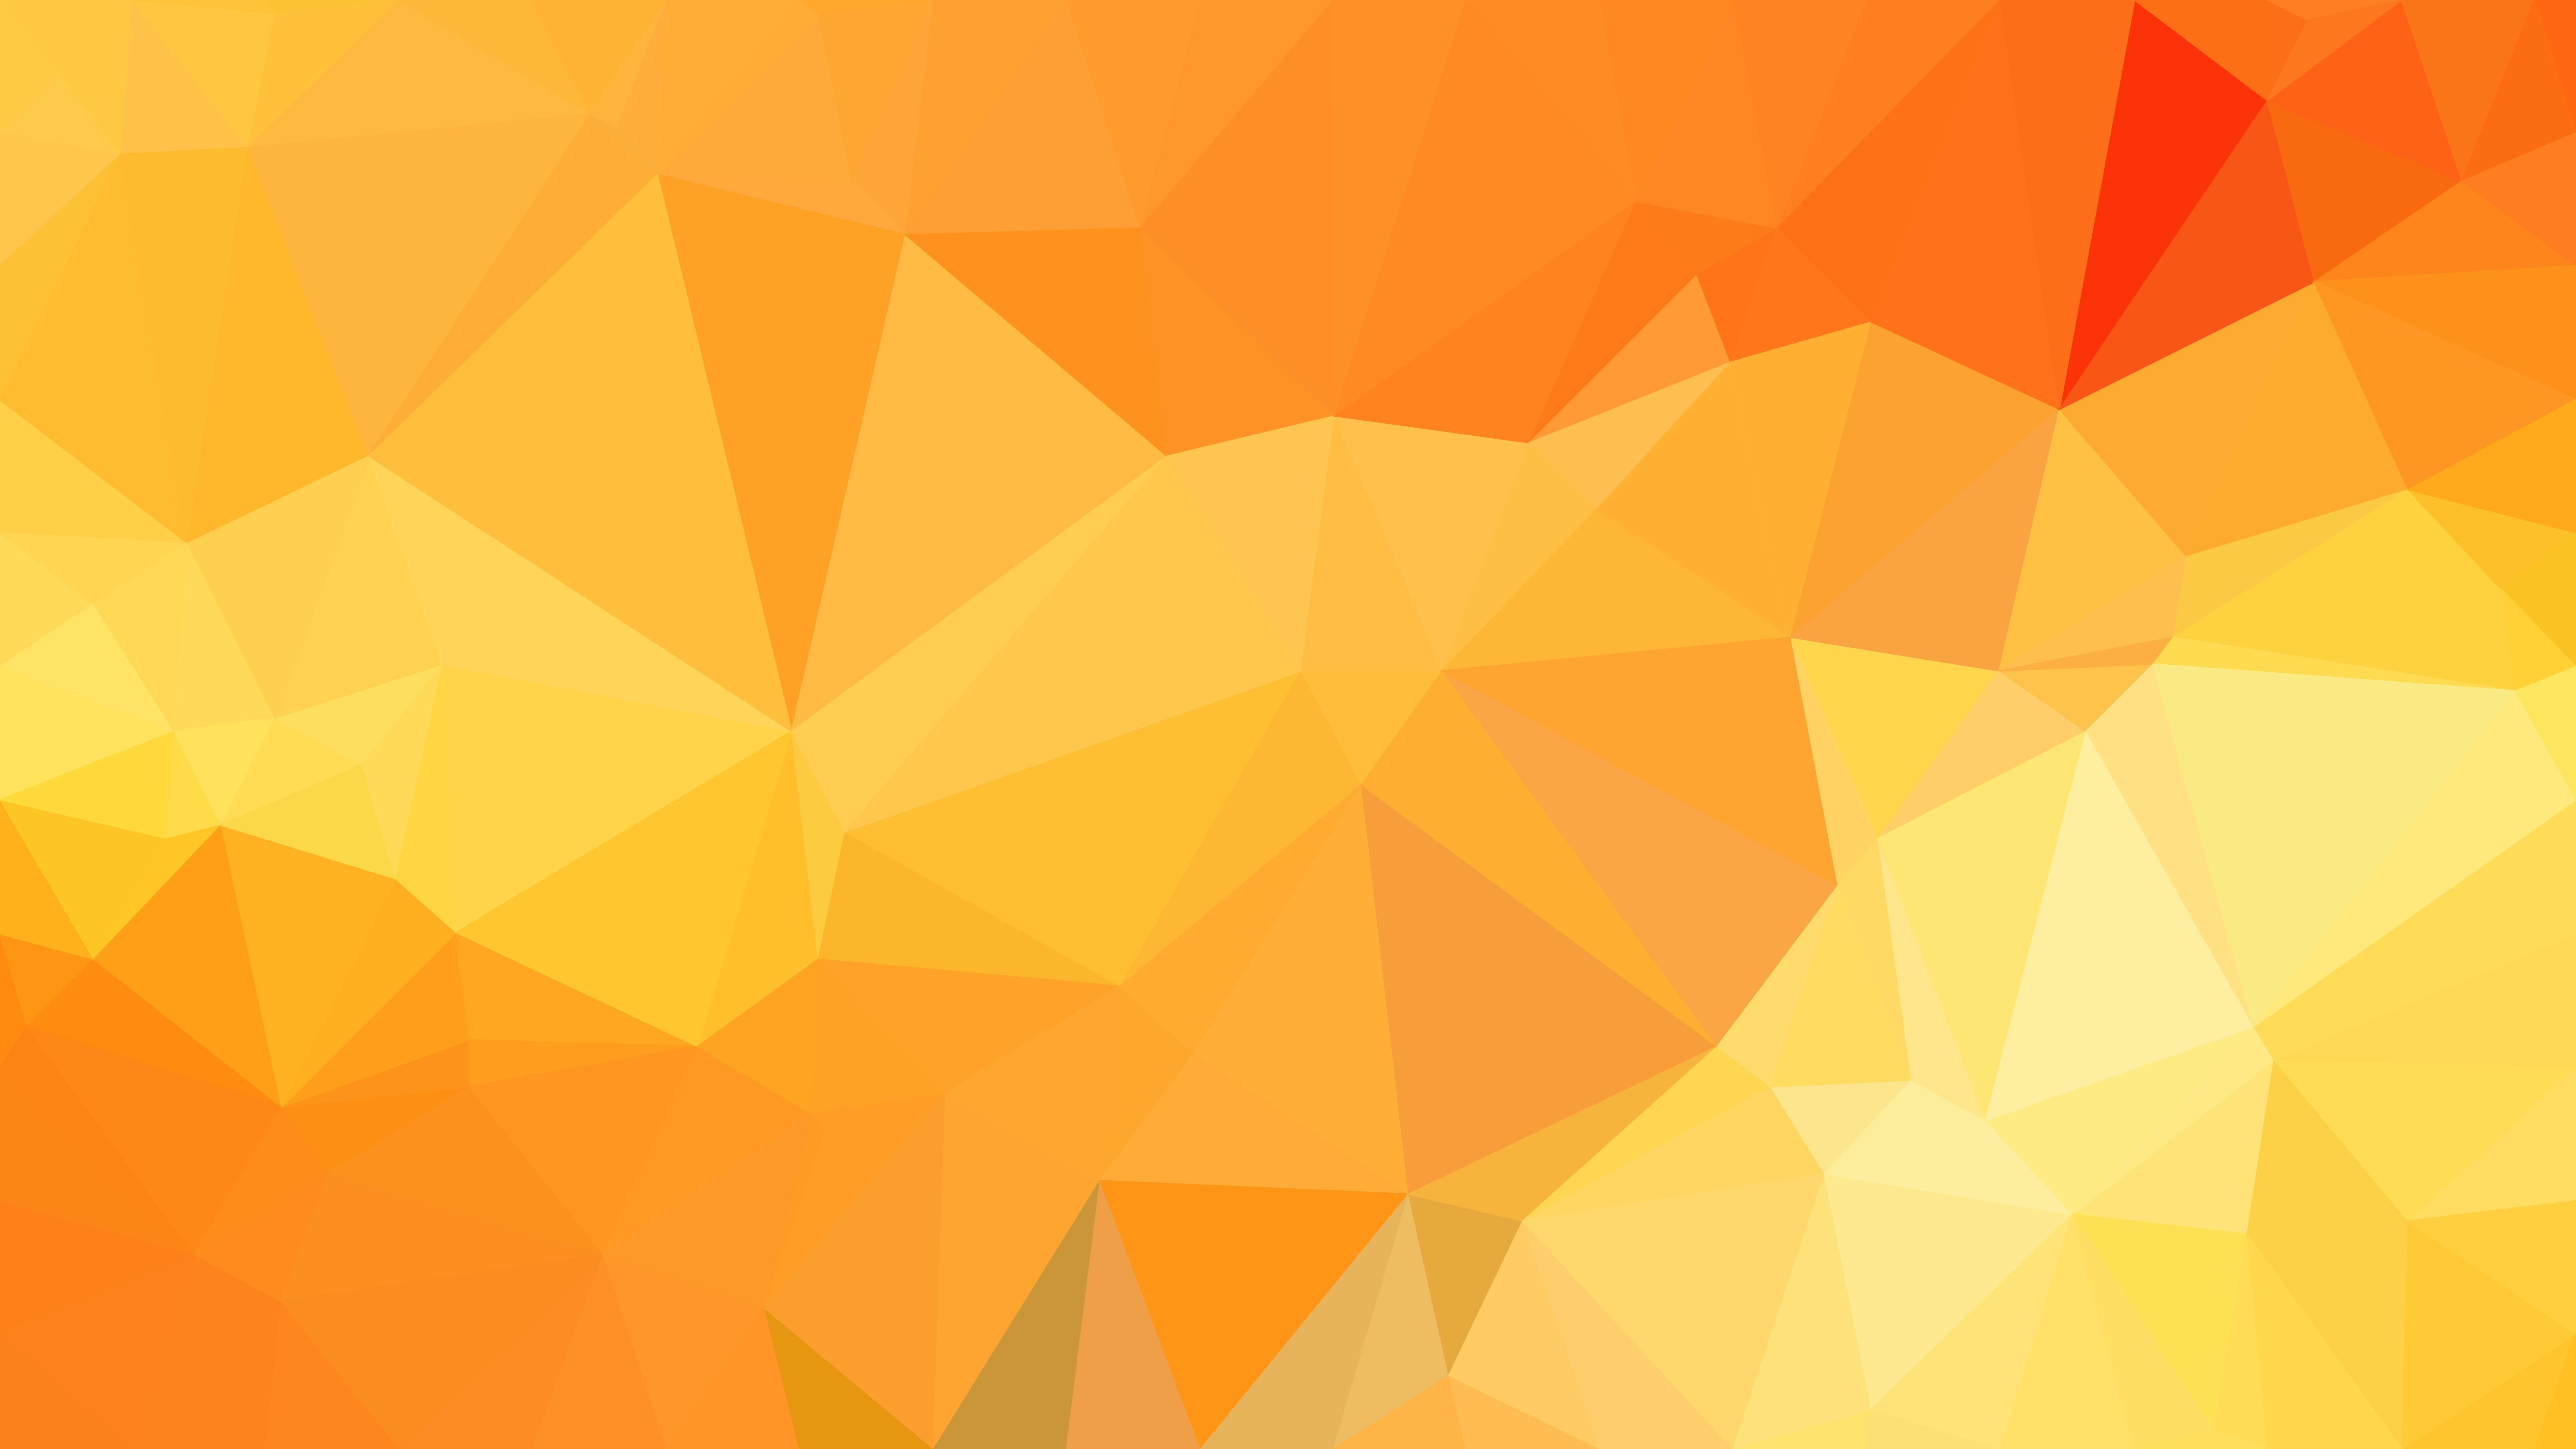 Free Orange And Yellow Polygon Background Design